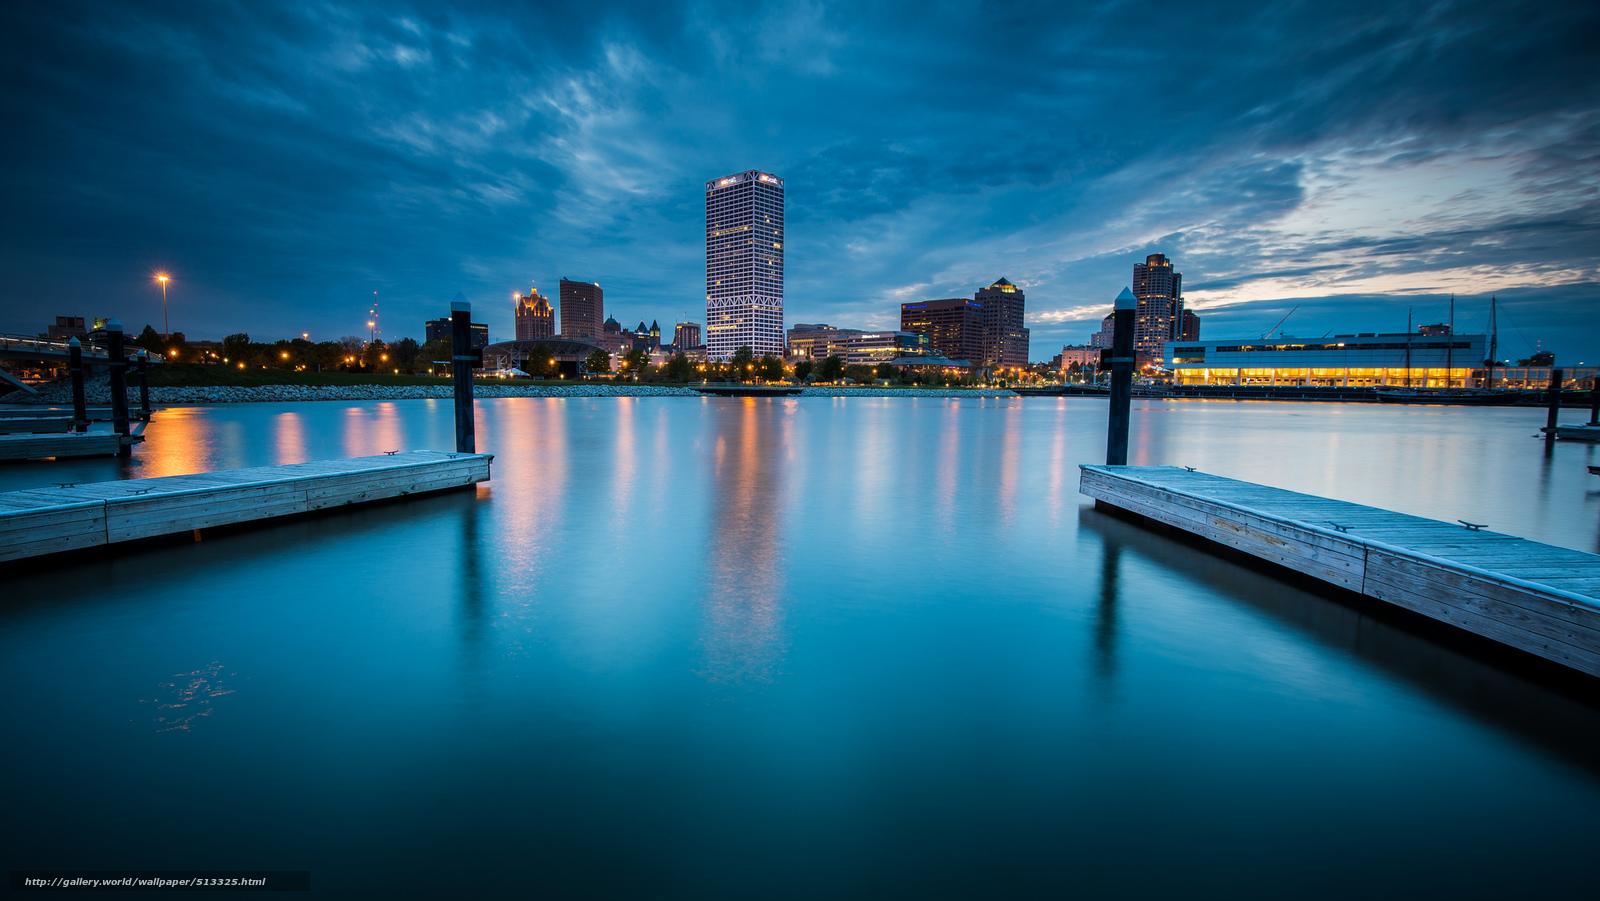 47+] Milwaukee Desktop Wallpapers on